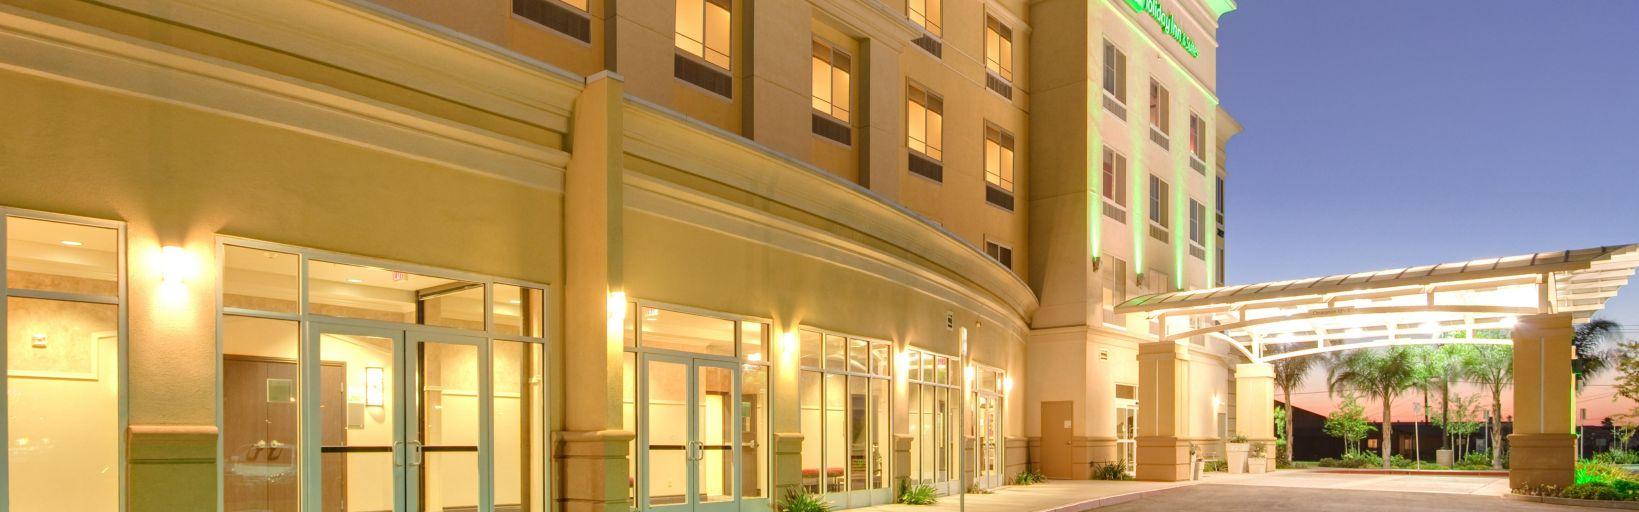 Holiday Inn Hotel & Suites Bakersfield Hotel by IHG